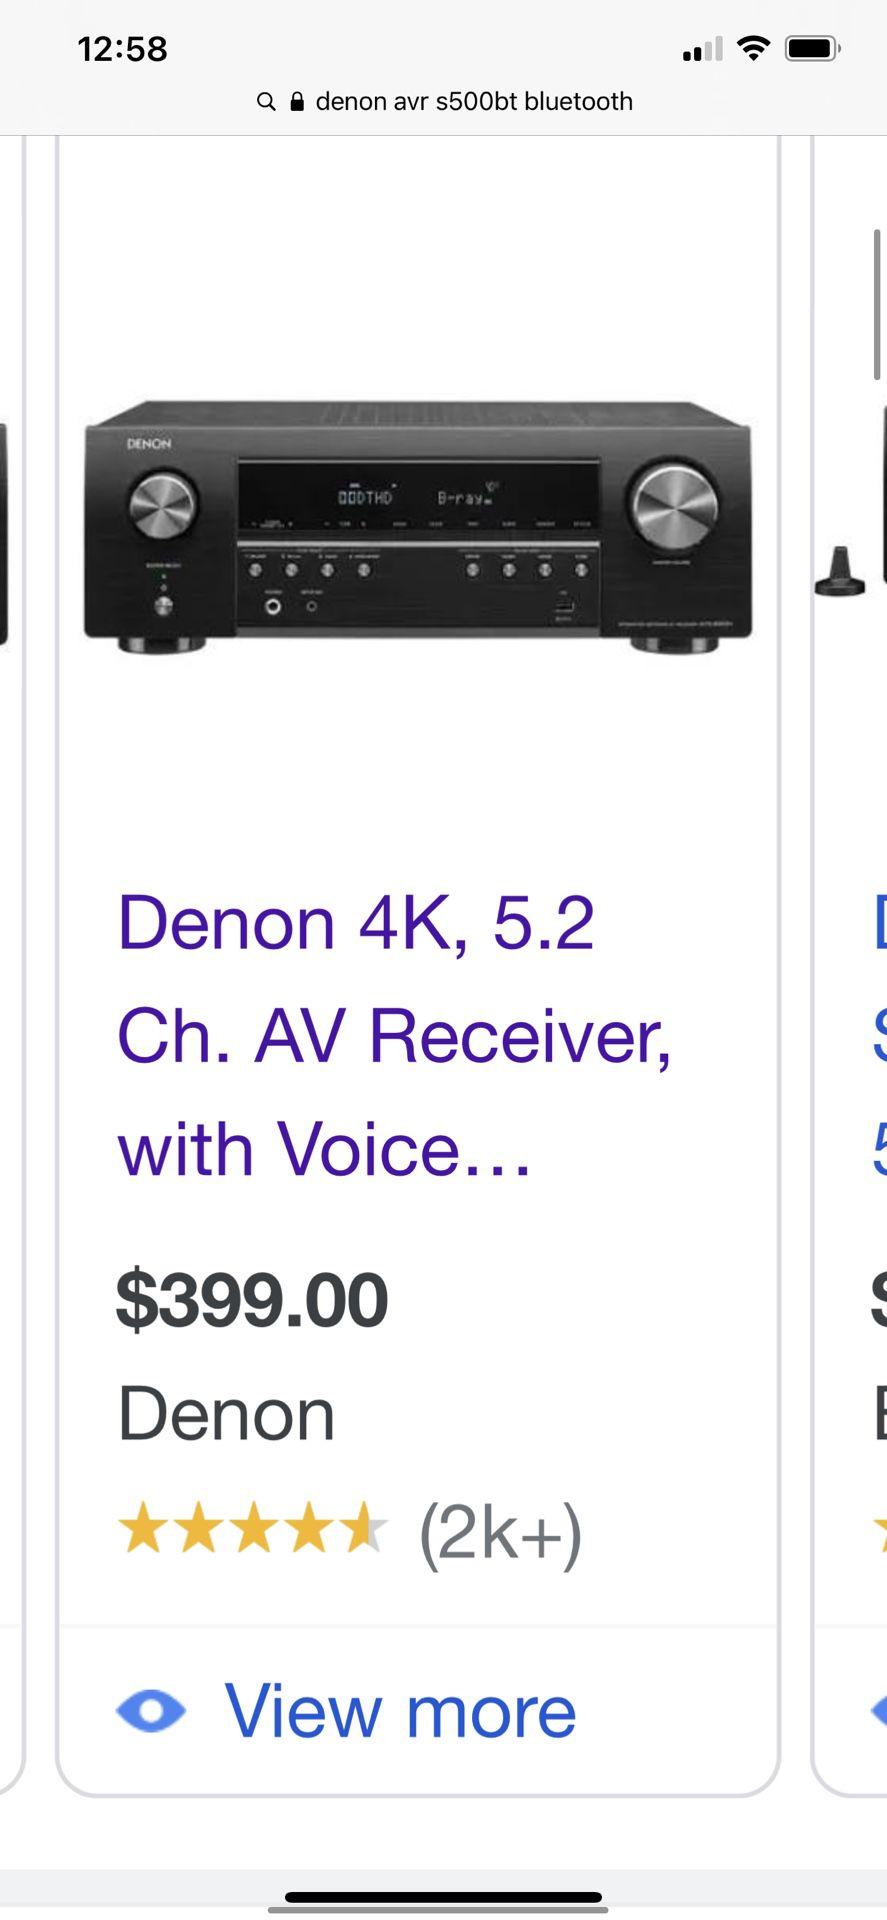 Denon Surround sound receiver and Bose speakers